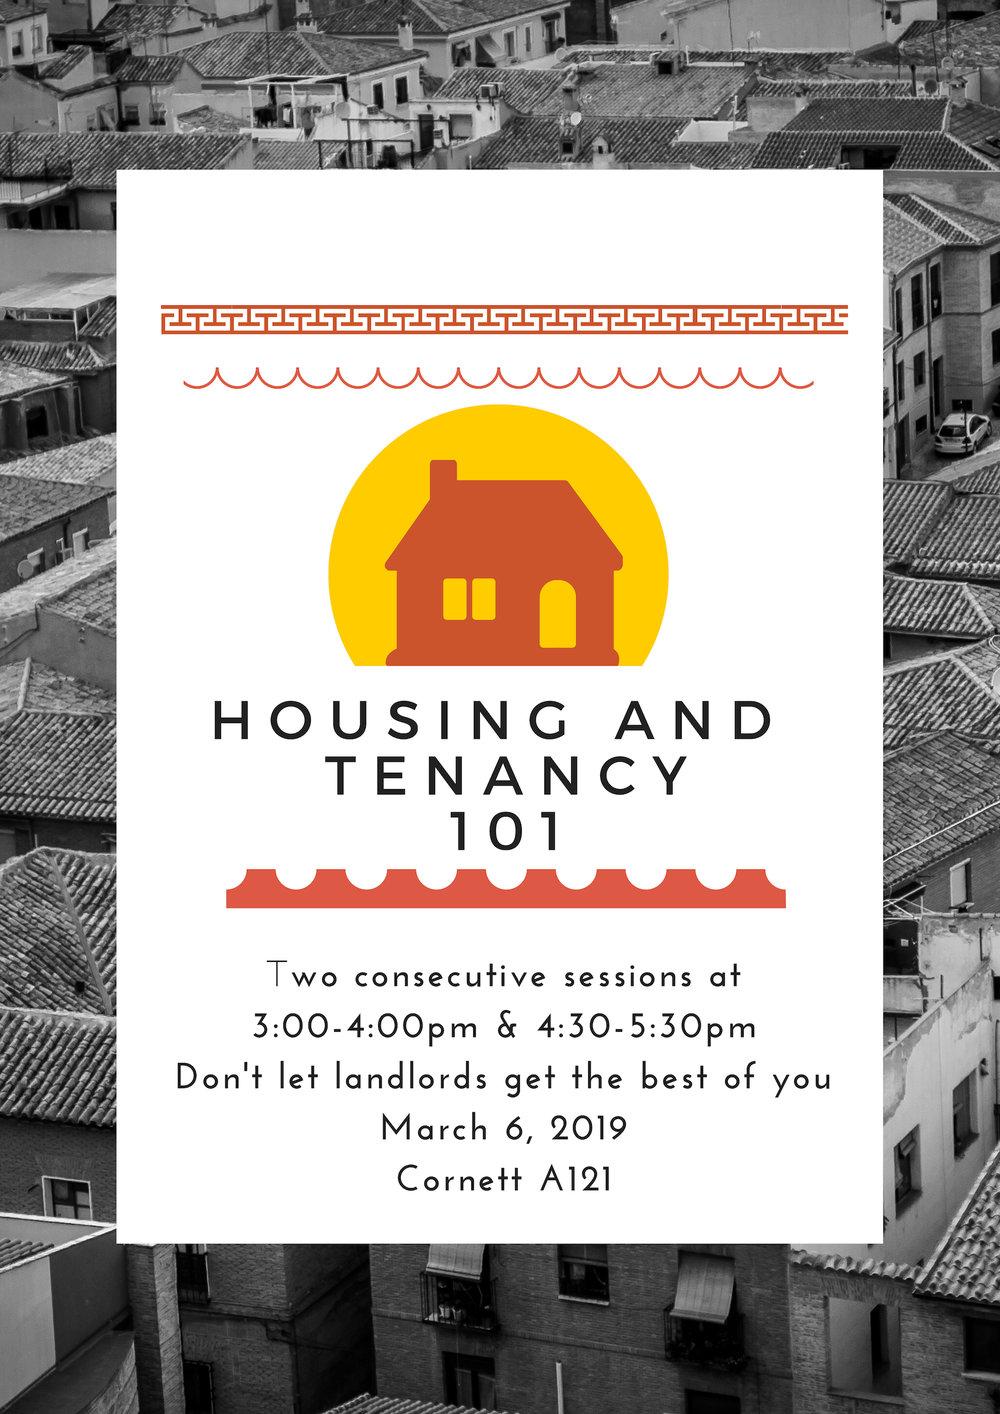 tenancy event.jpg